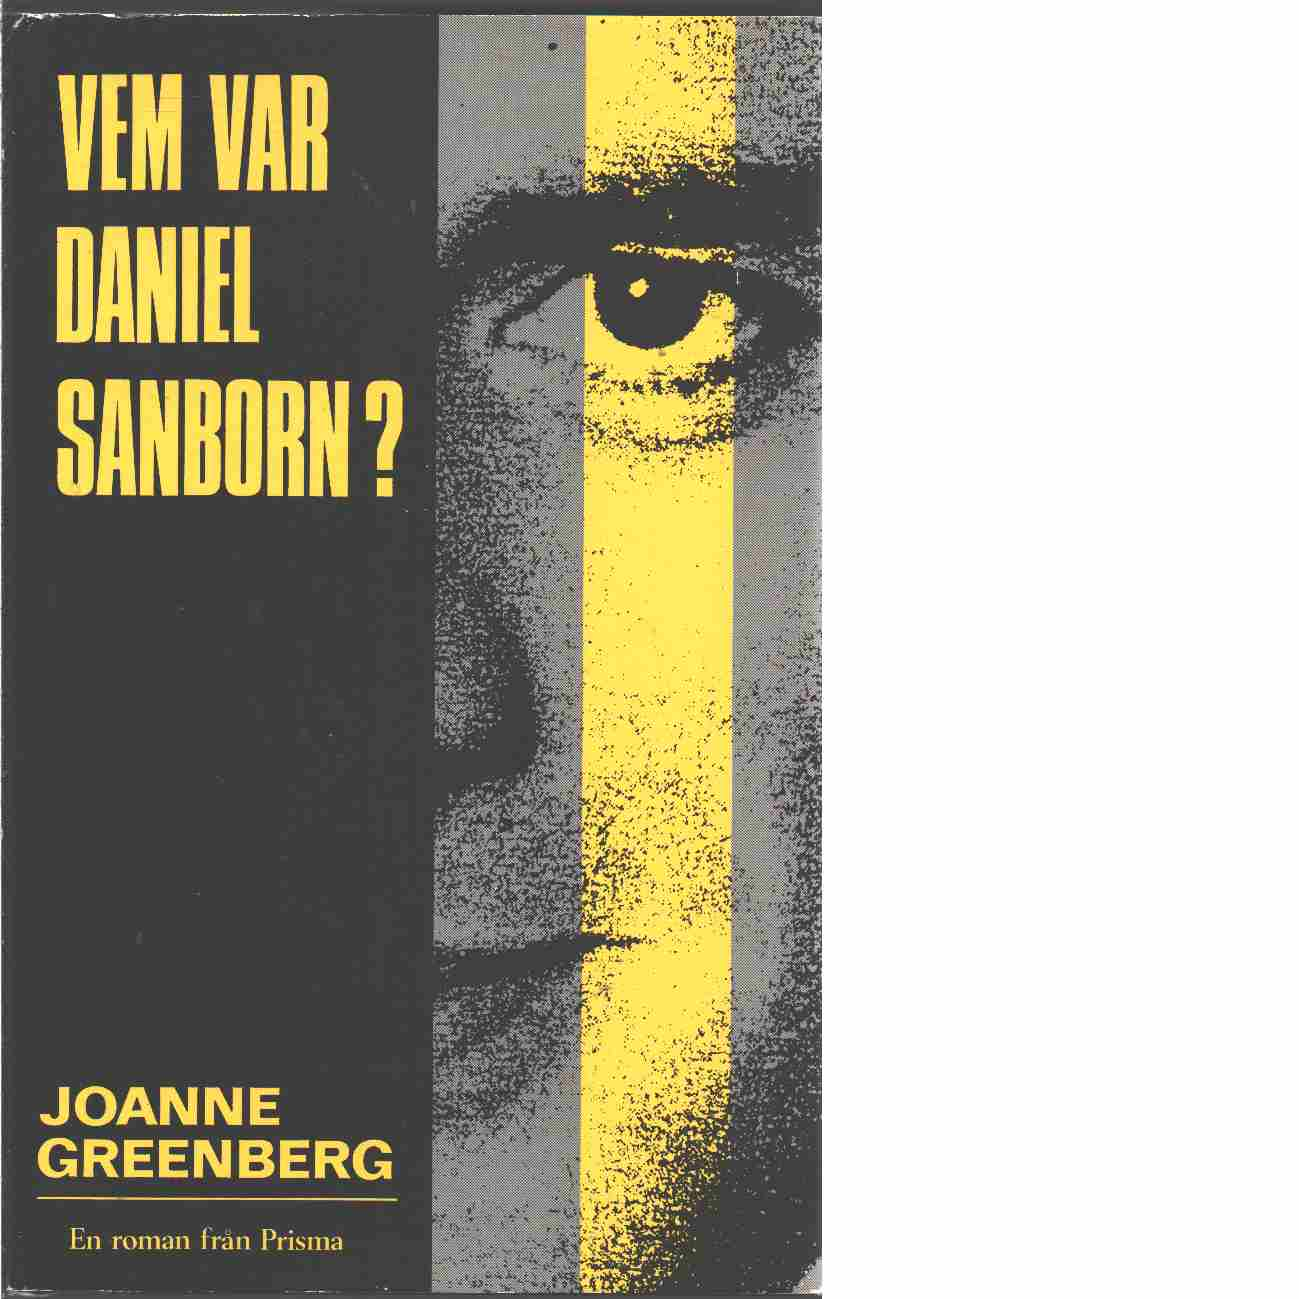 Vem var Daniel Sanborn? - Greenberg, Joanne